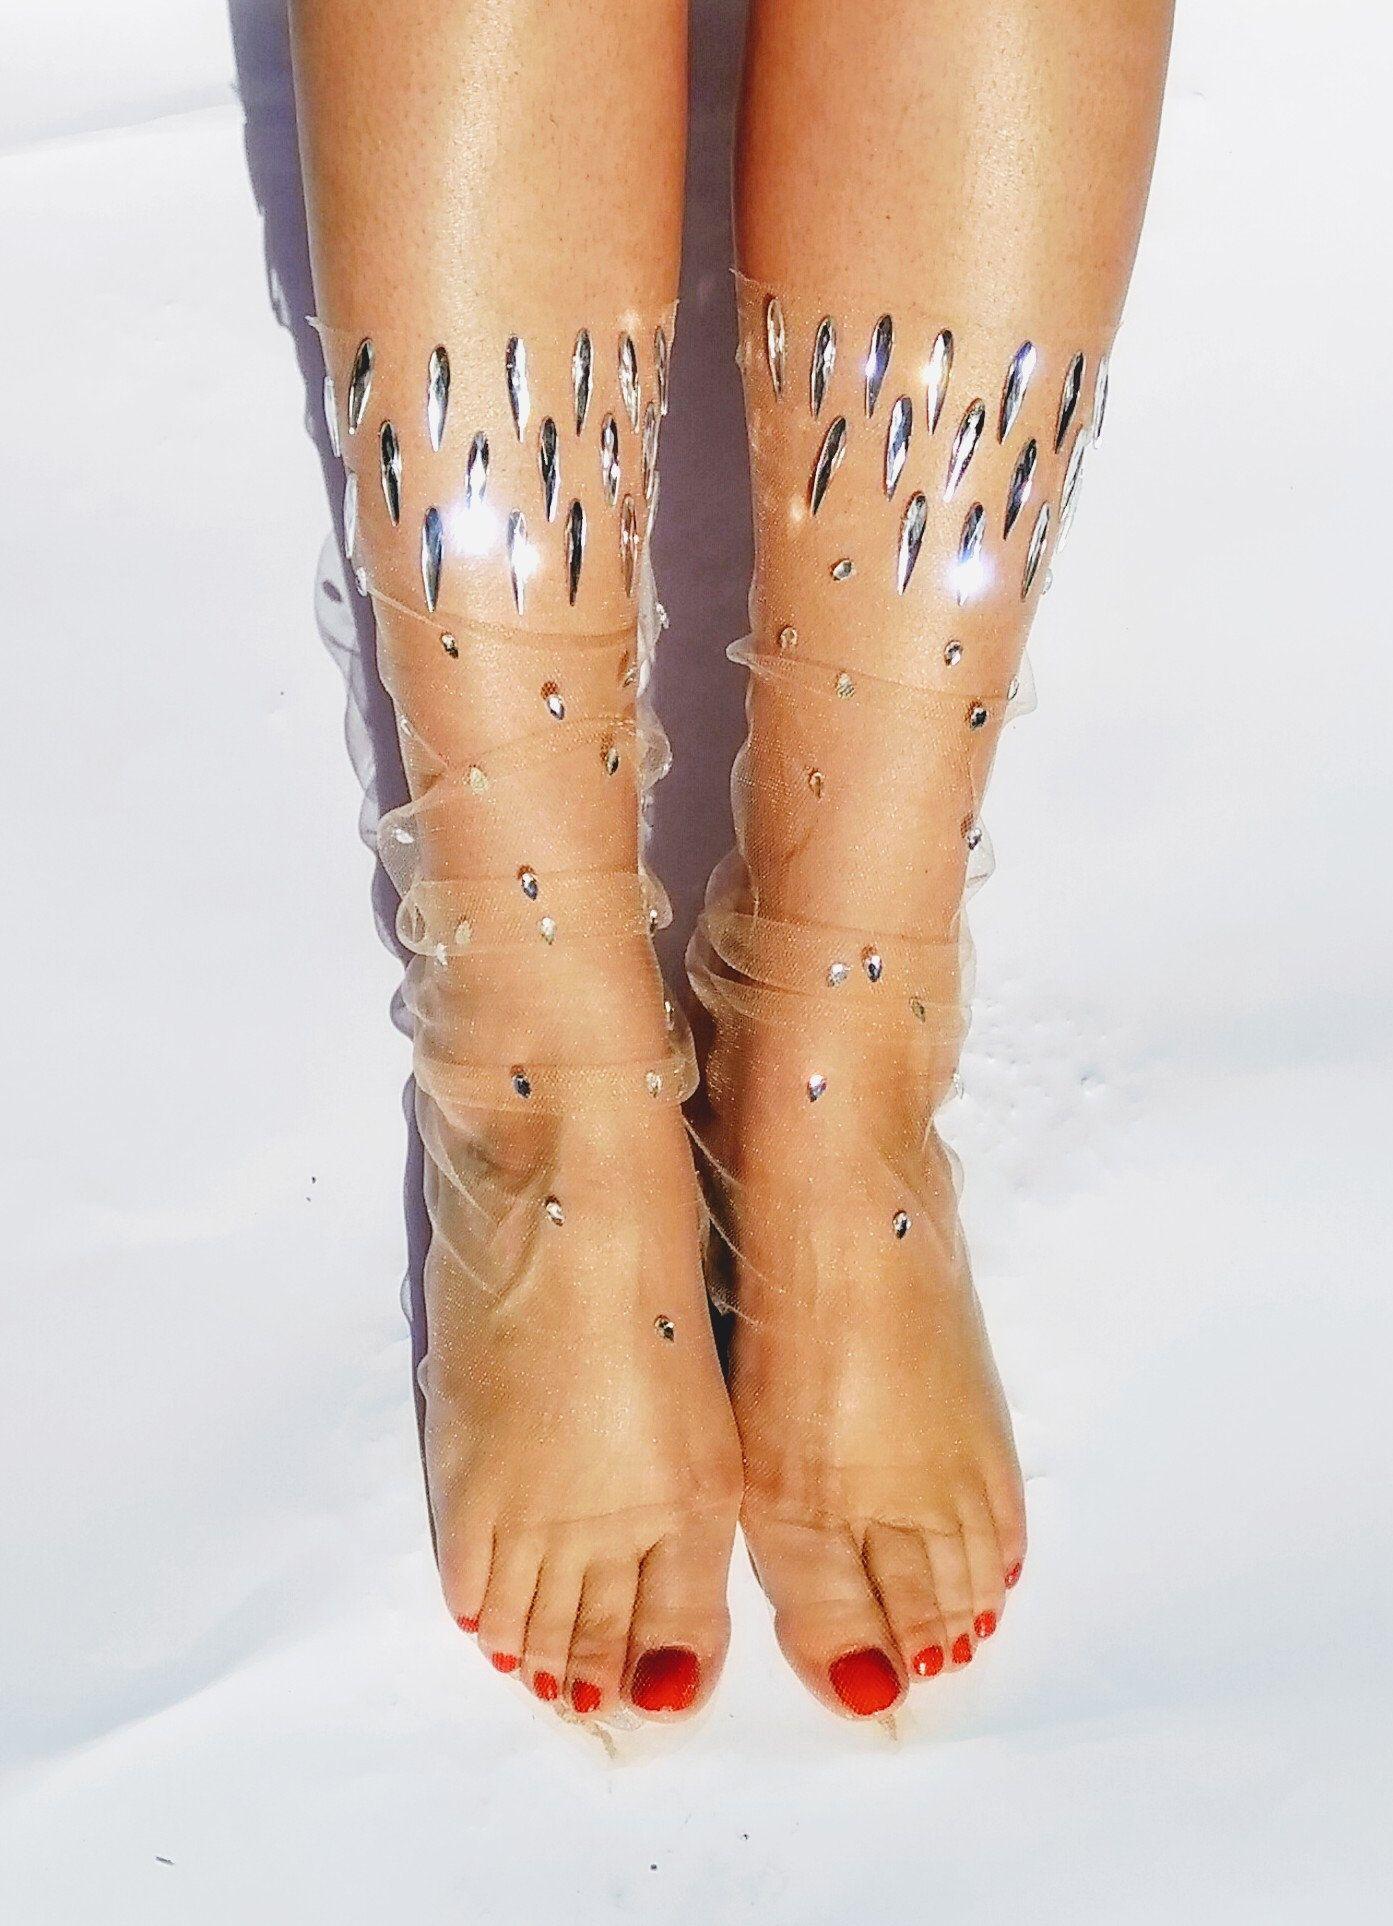 52835db5f Tulle Socks. Sheer Transparent Cute Novelty Rhinestone Socks. Gift ...